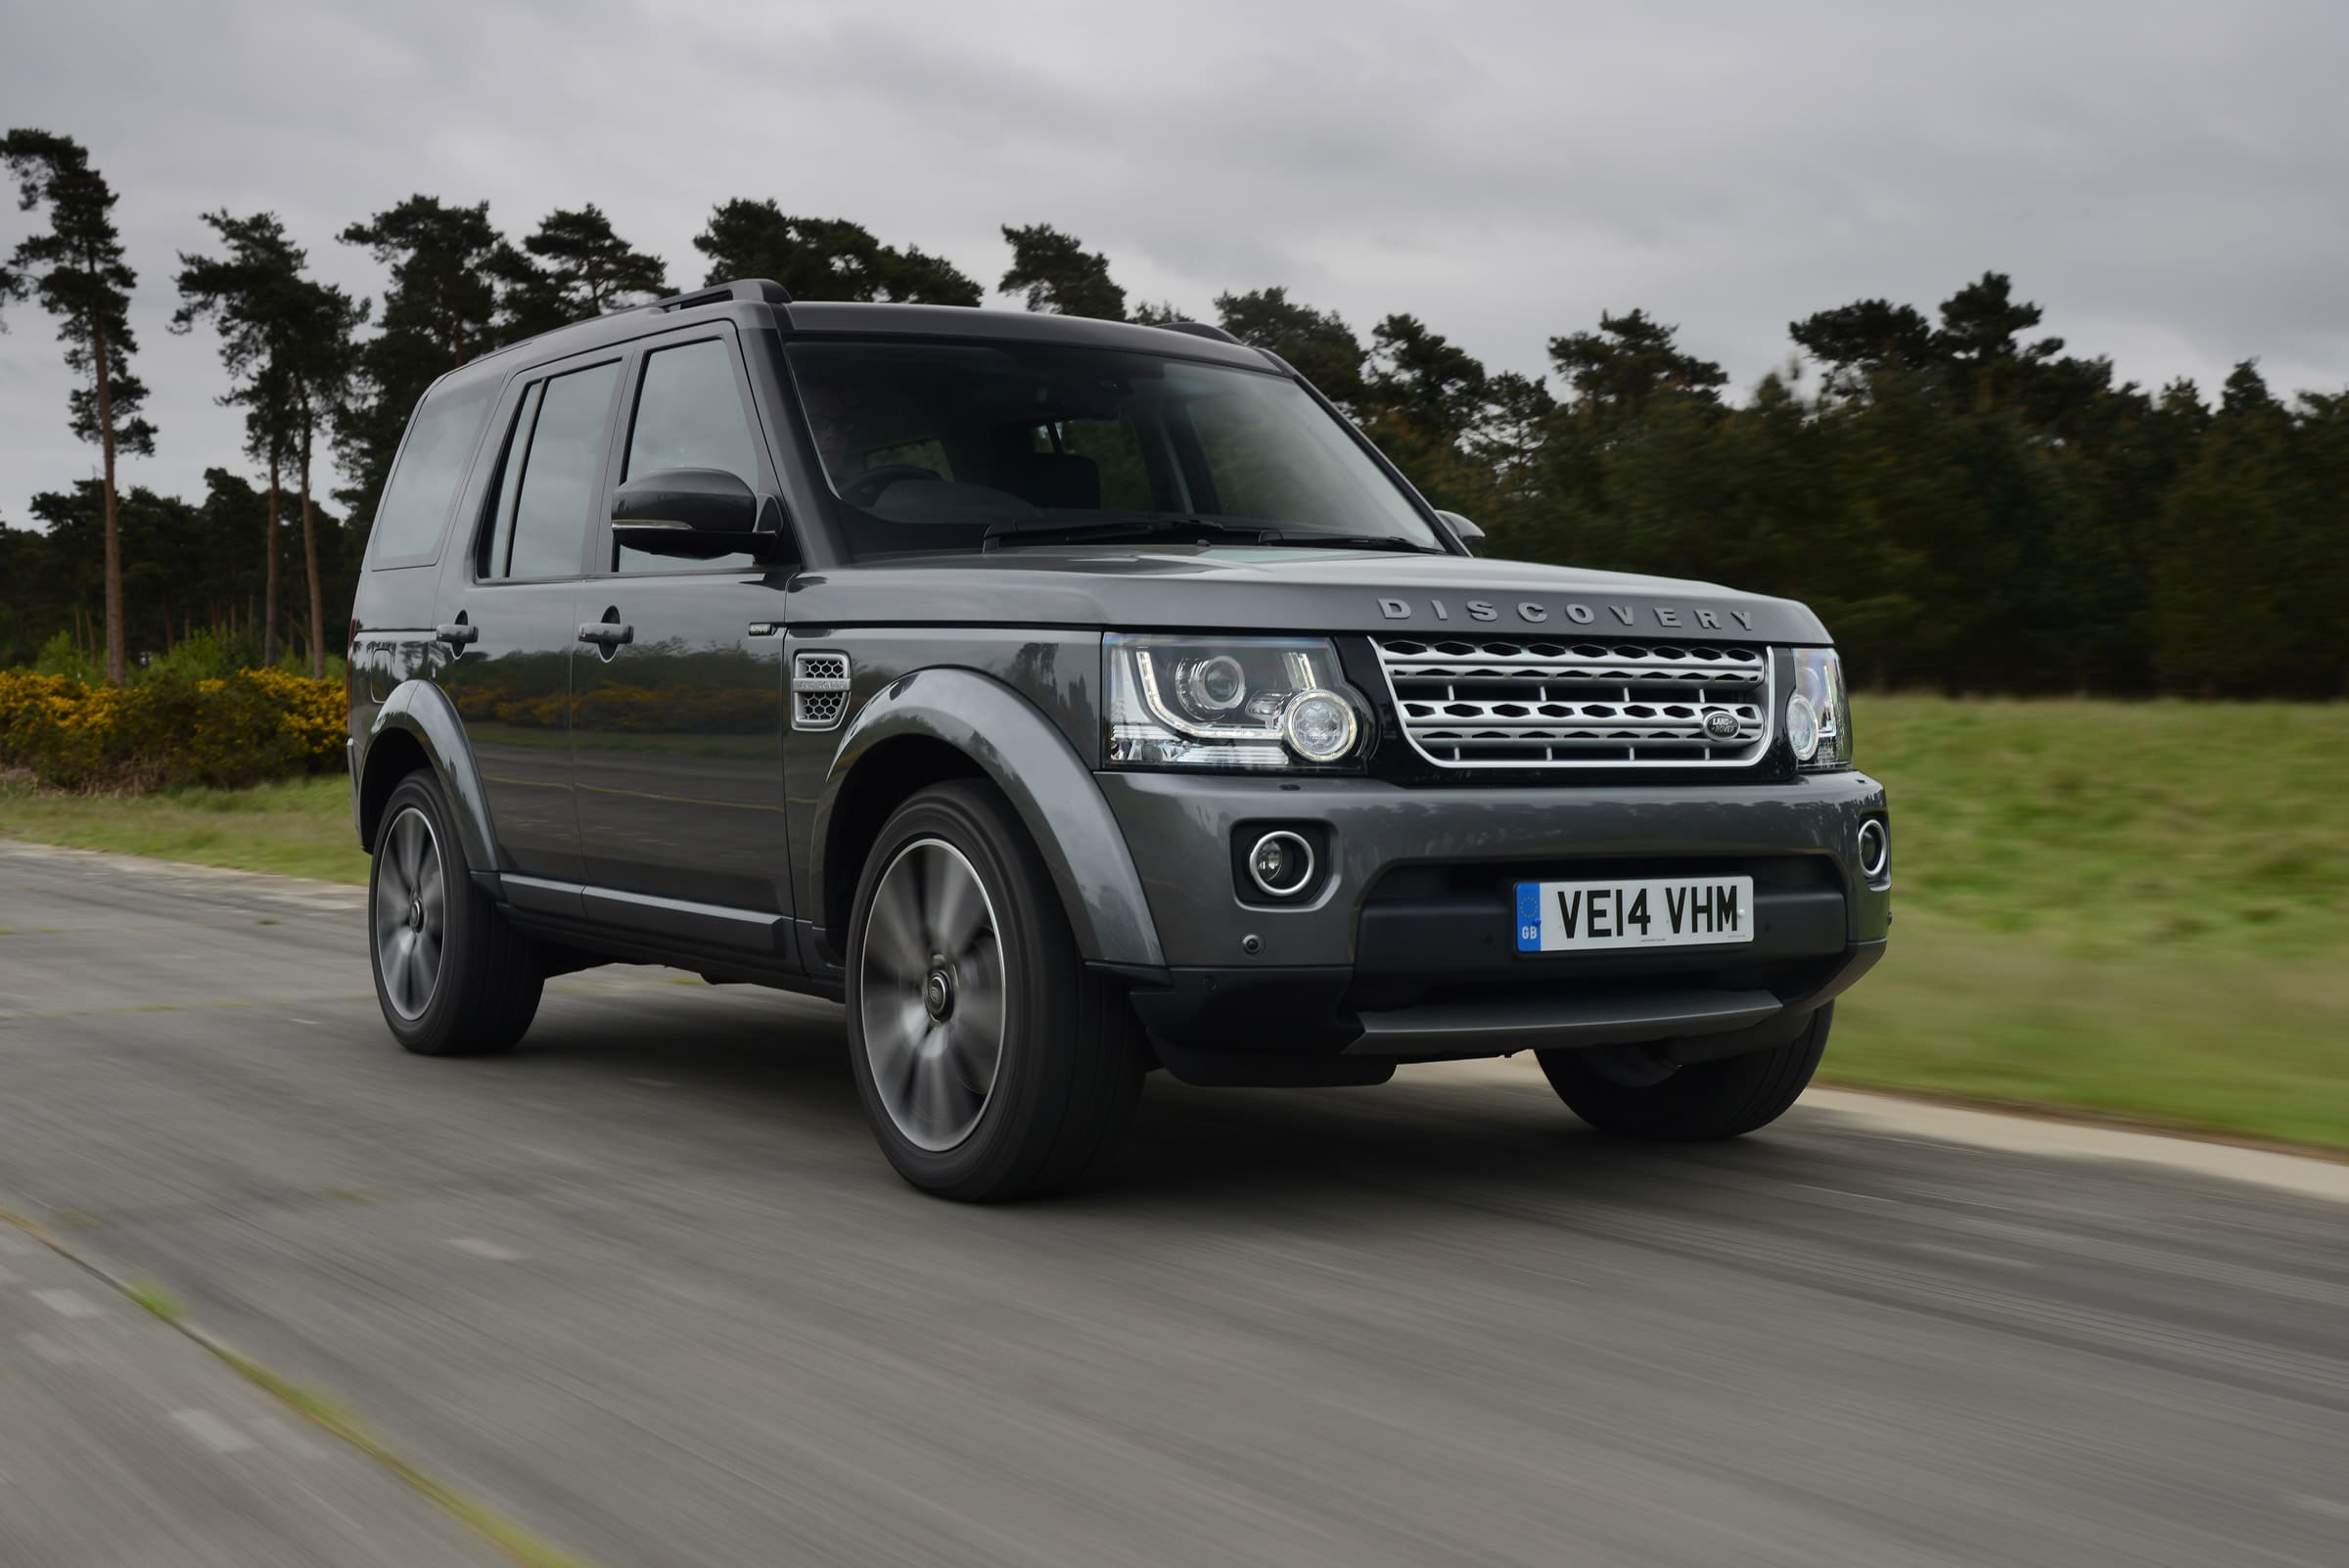 2008 Land Rover LR3 | Photo Source: AutoExpress.uk